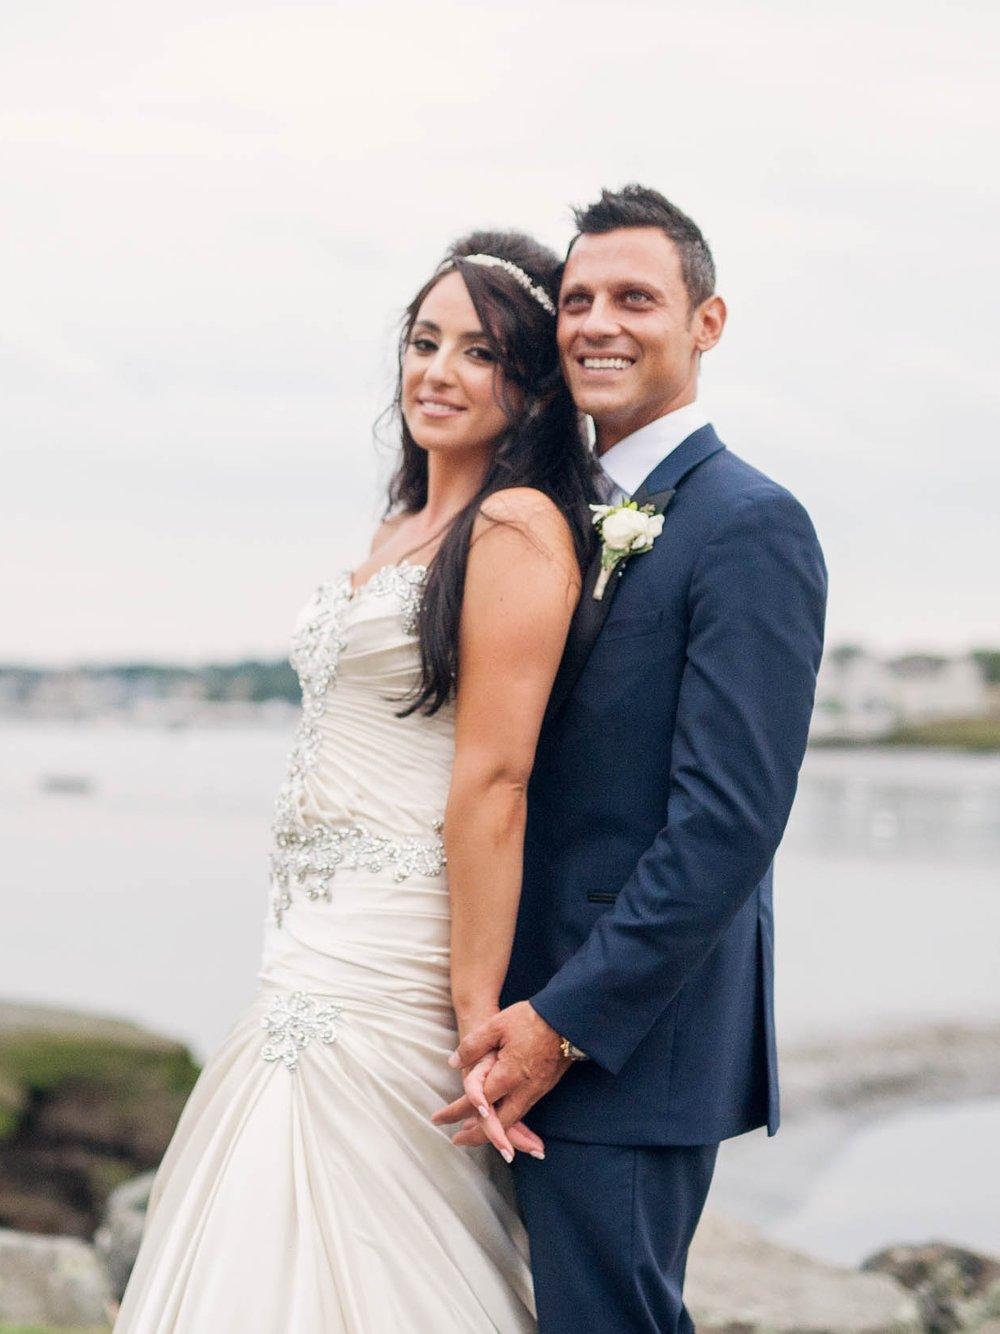 AGGELIKI & STATHIS - Γάμος στη Βοστώνη